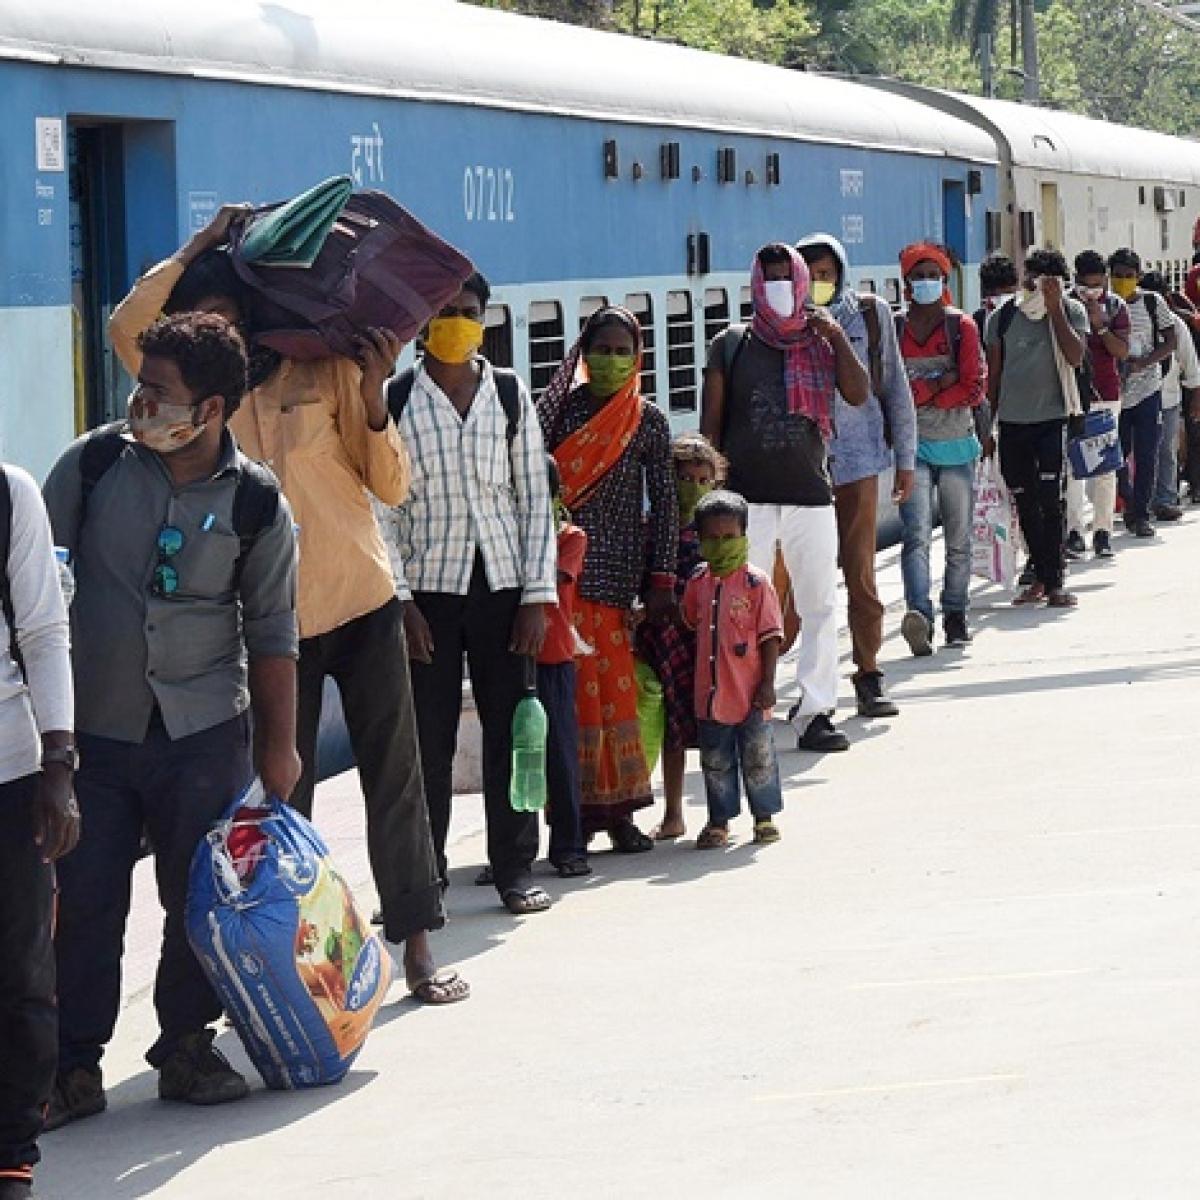 Seniors, pregnant women, kids must avoid travel on Shramik trains, says Indian Railways